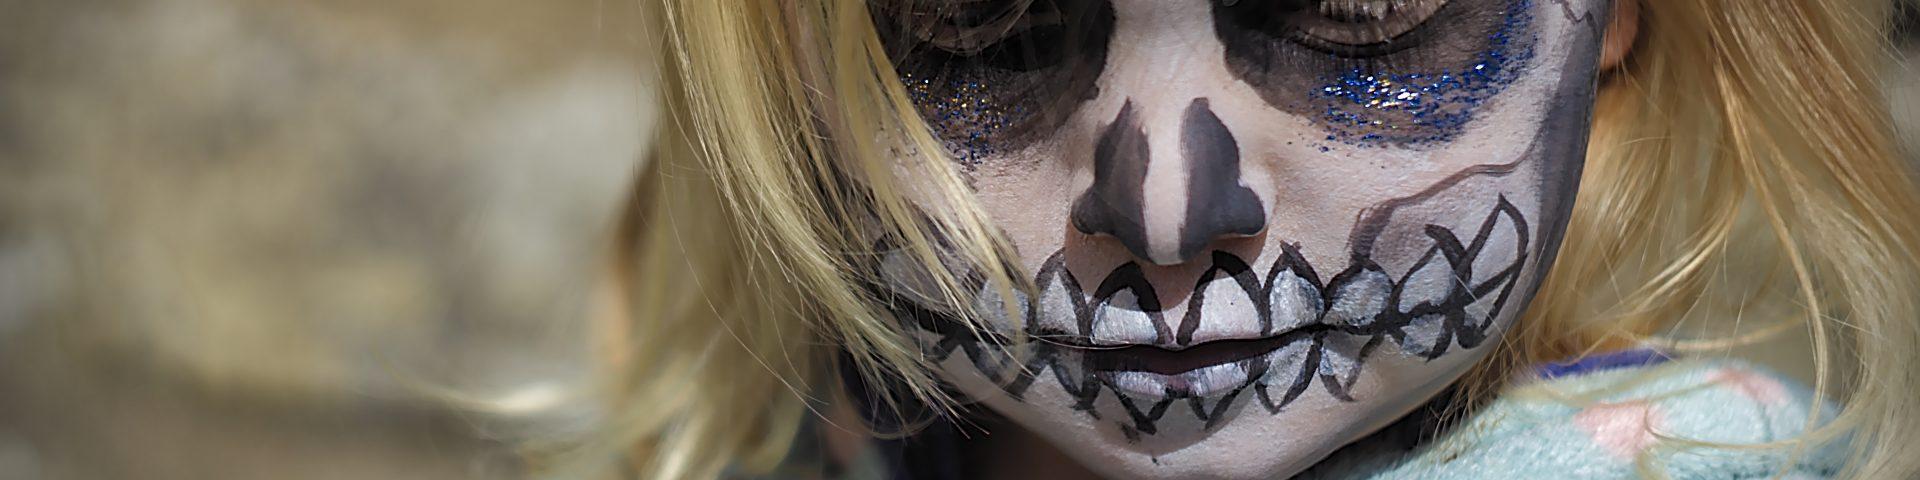 Kind geschminkt Totenkopf Fotoparade 2019